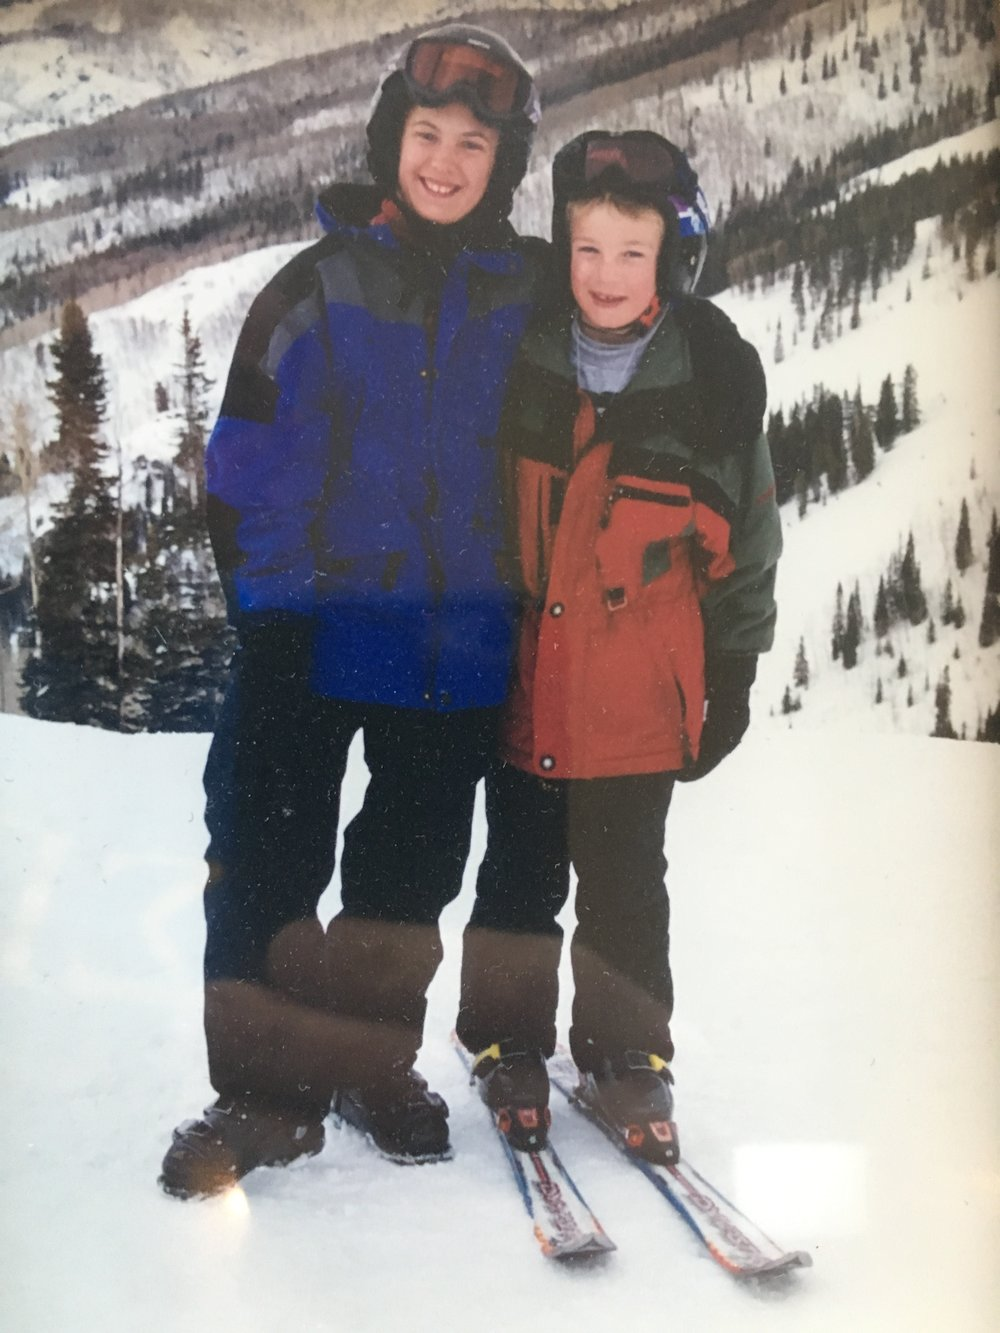 Jeff & Miles skiing